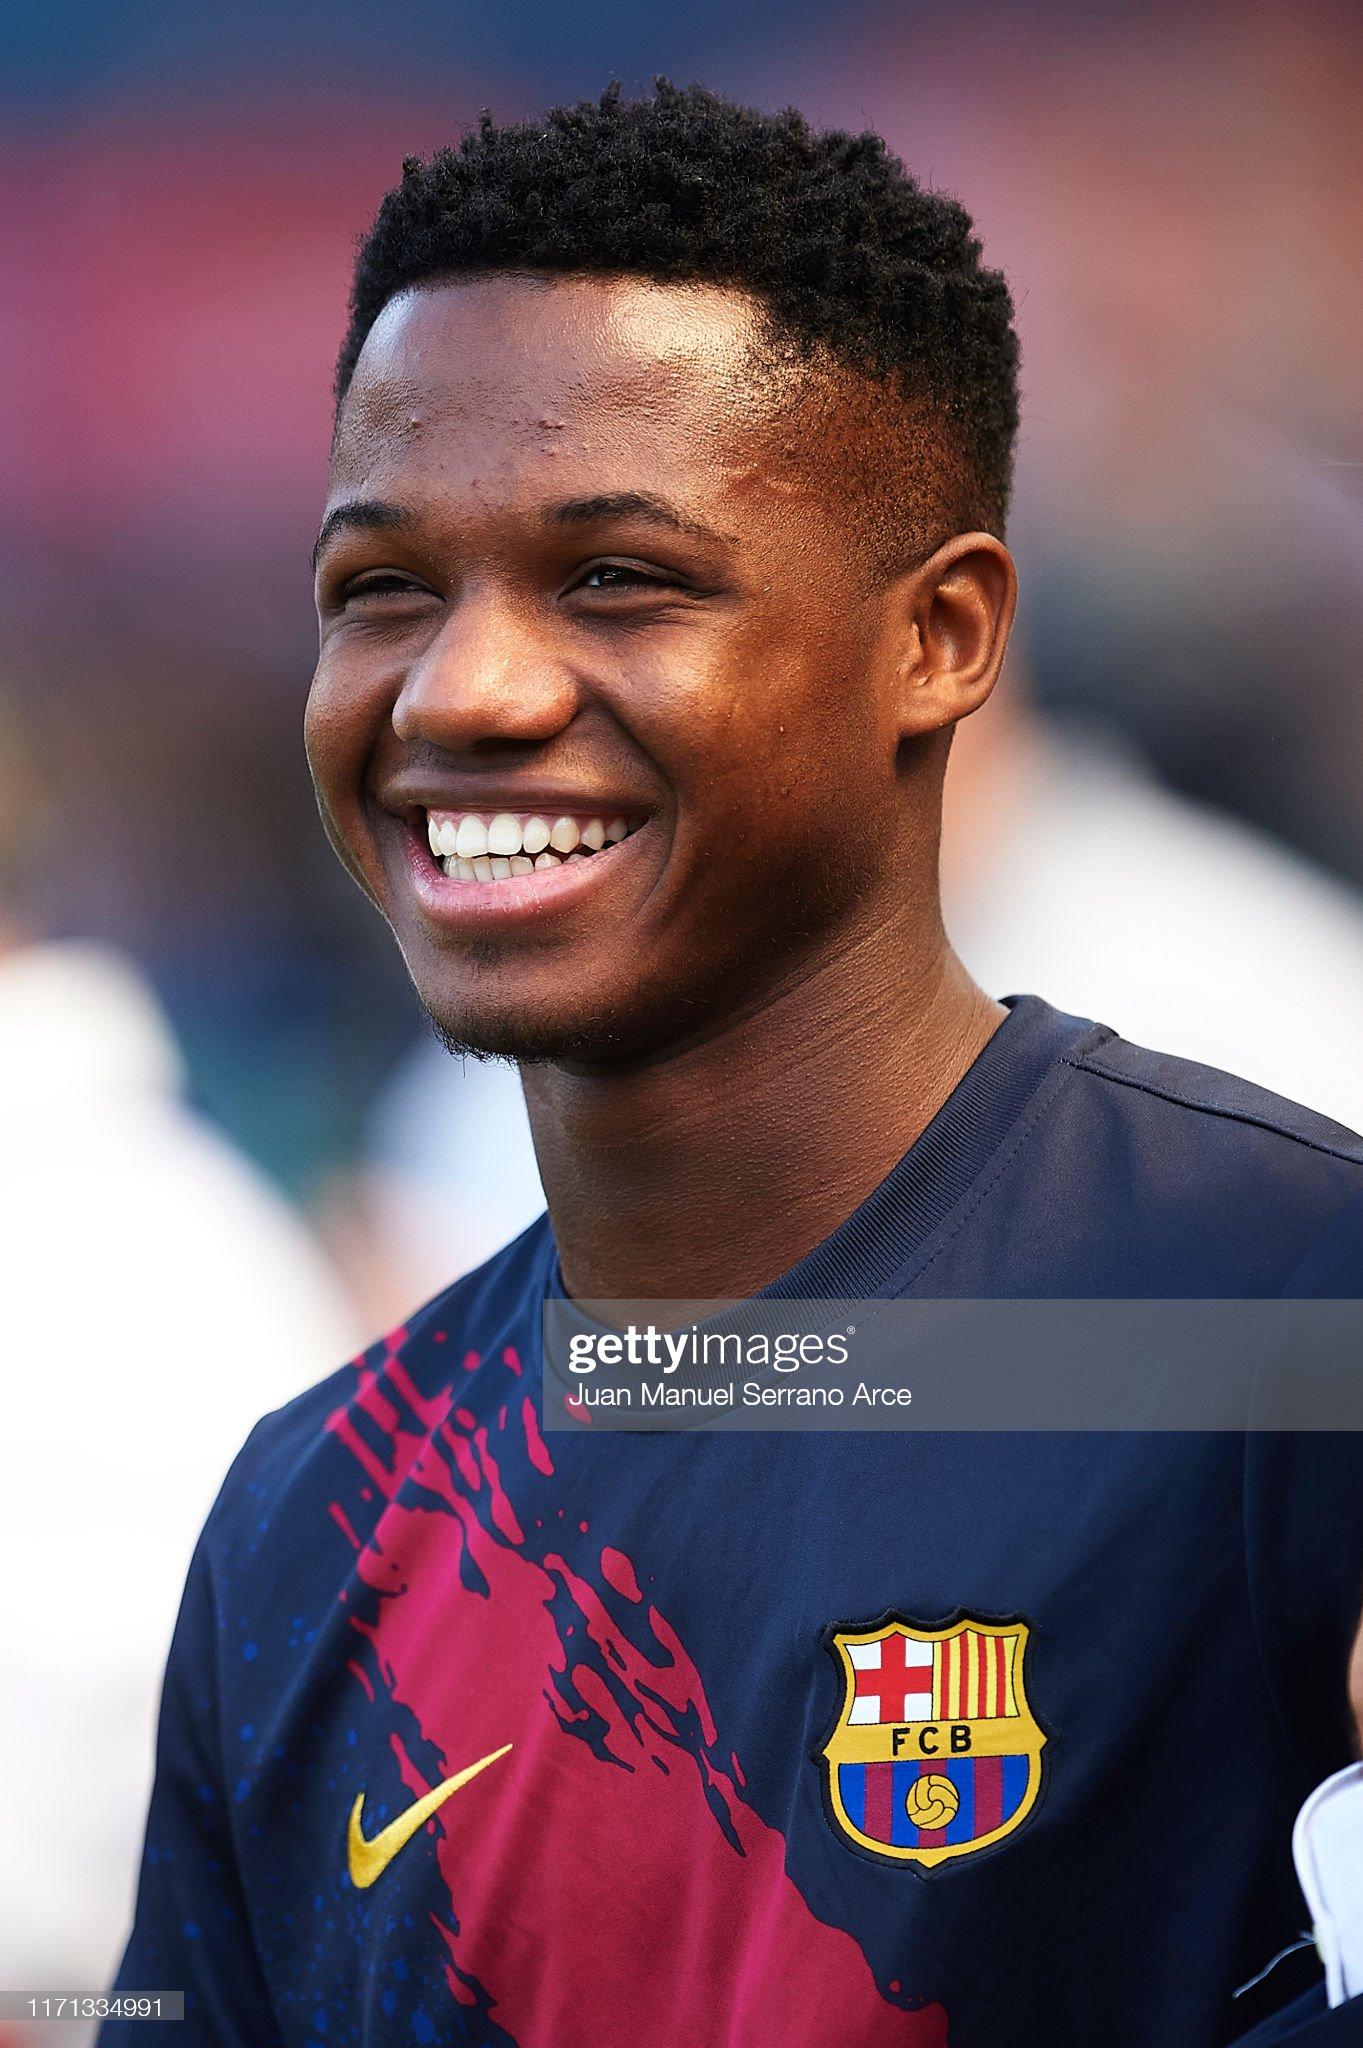 صور مباراة : أوساسونا - برشلونة 2-2 ( 31-08-2019 )  Anssumane-fati-of-fc-barcelona-smiles-during-the-warm-up-prior-to-the-picture-id1171334991?s=2048x2048